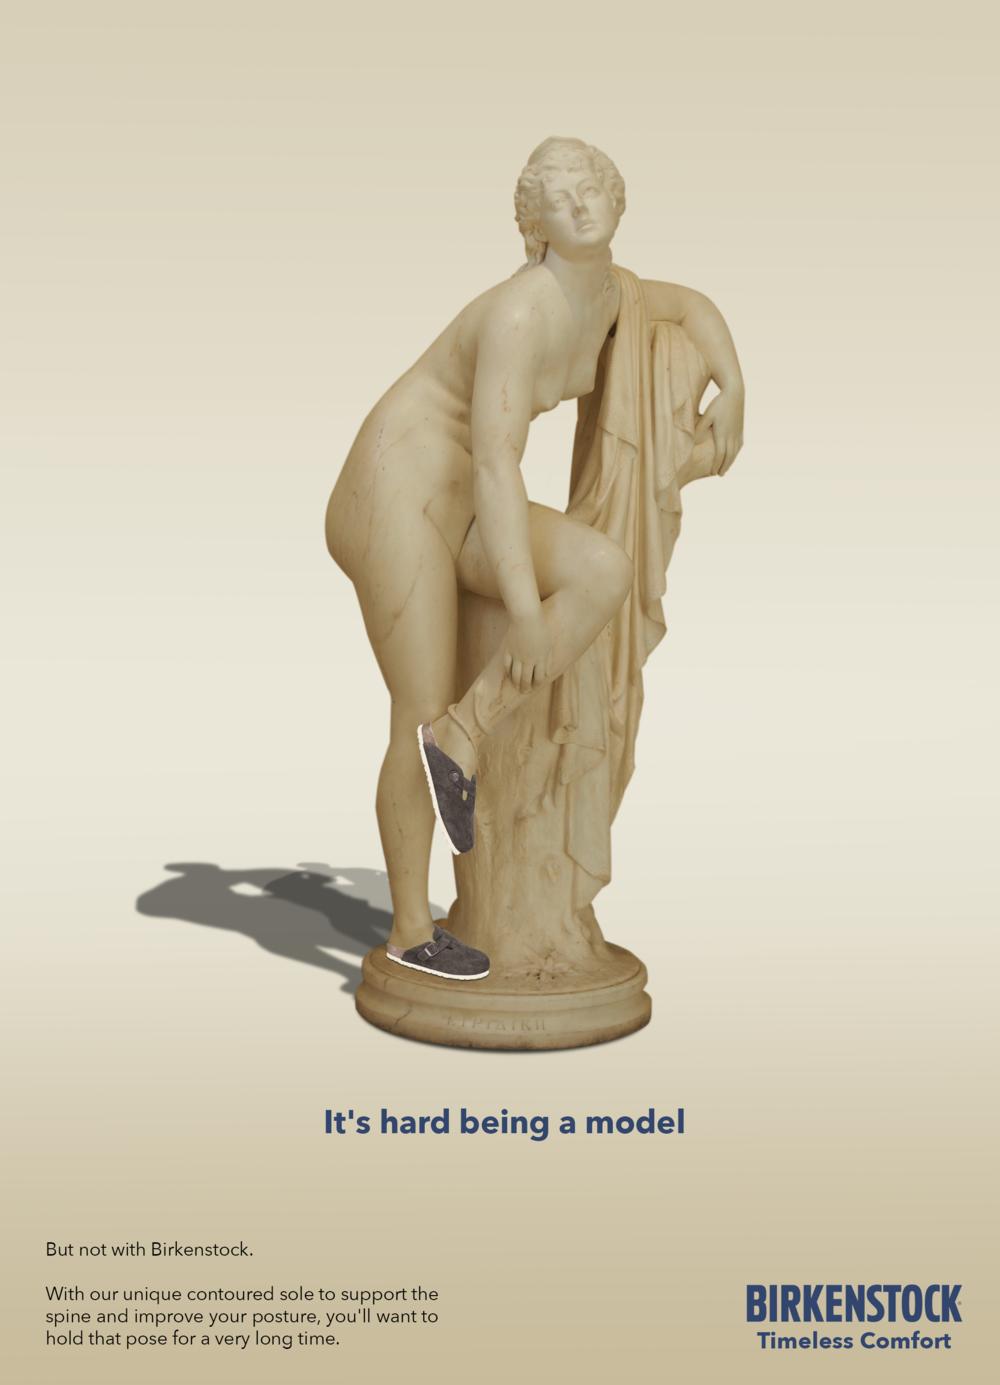 birkenstockmodel.png